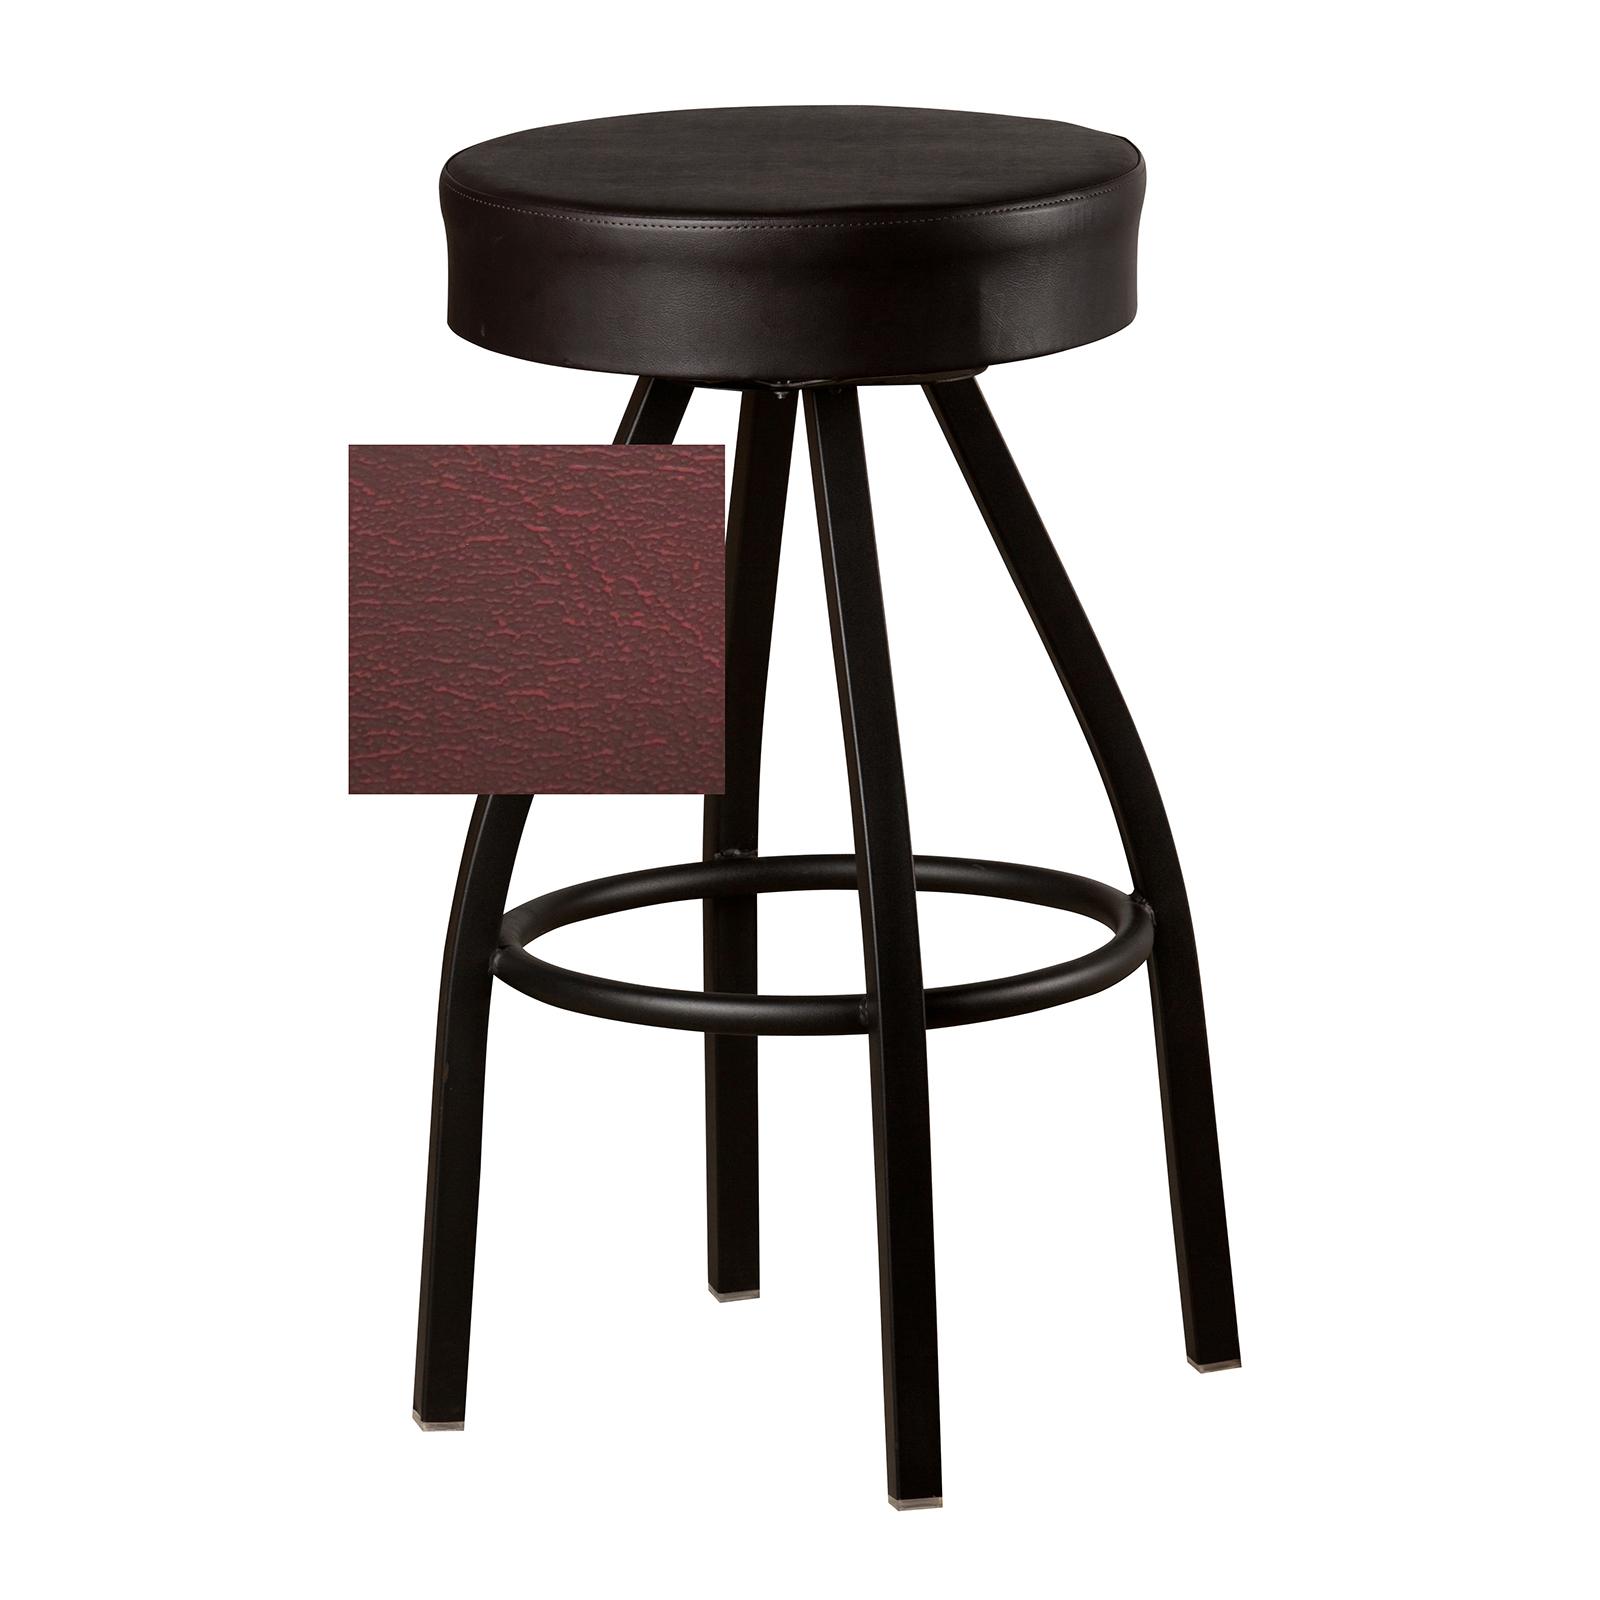 Oak Street SL3132-WINE bar stool, swivel, indoor